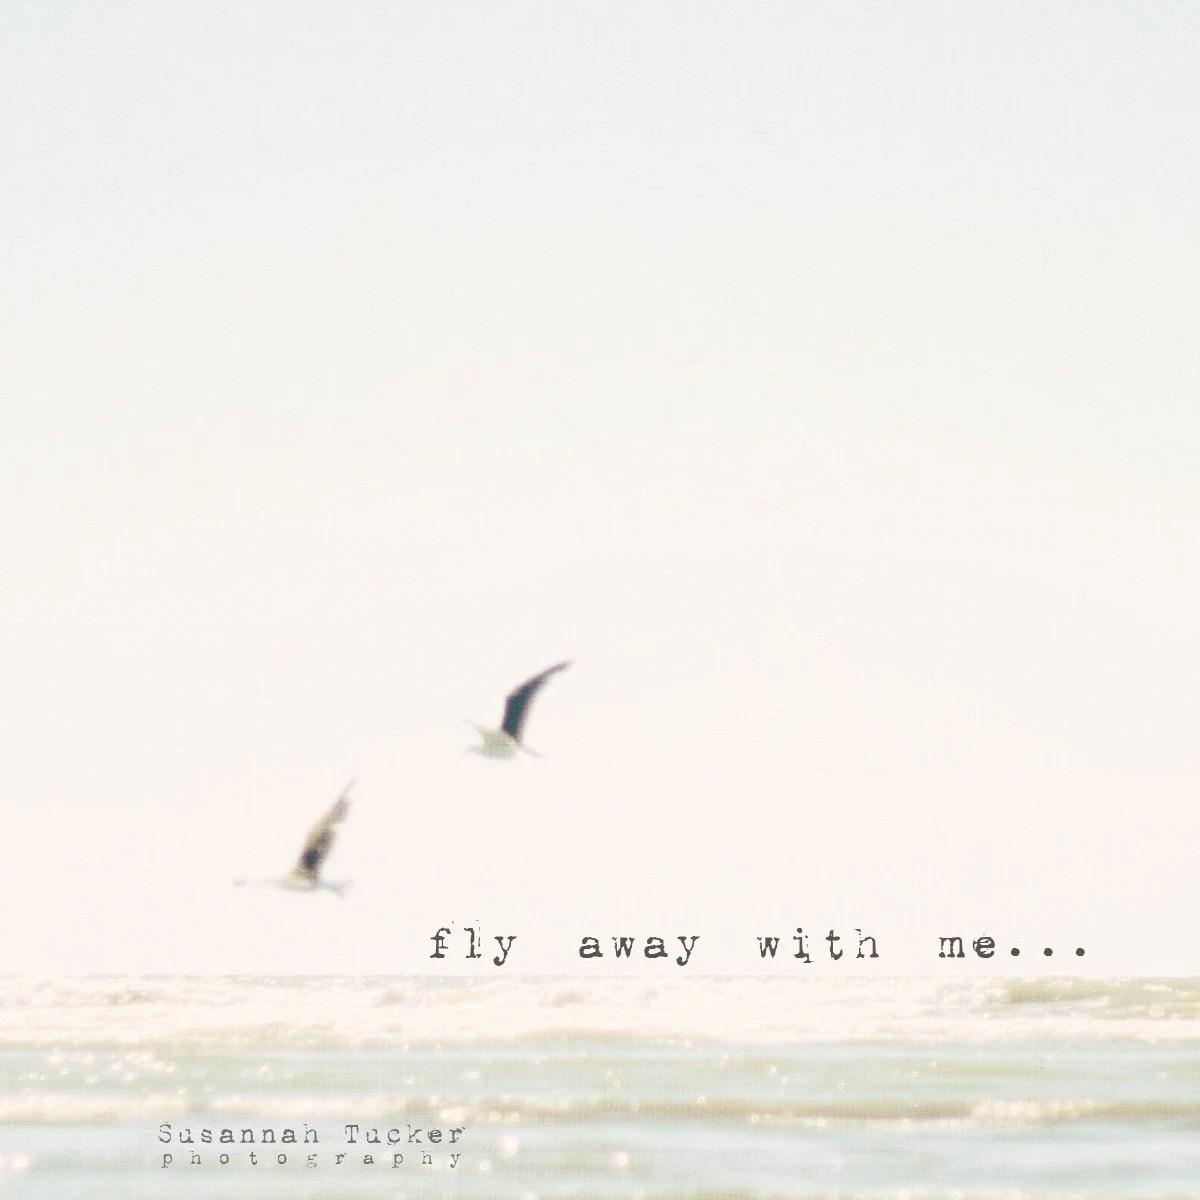 "fly away with me, to where we feel the ocean breeze - 8x8"" beach photograph - SusannahTucker"